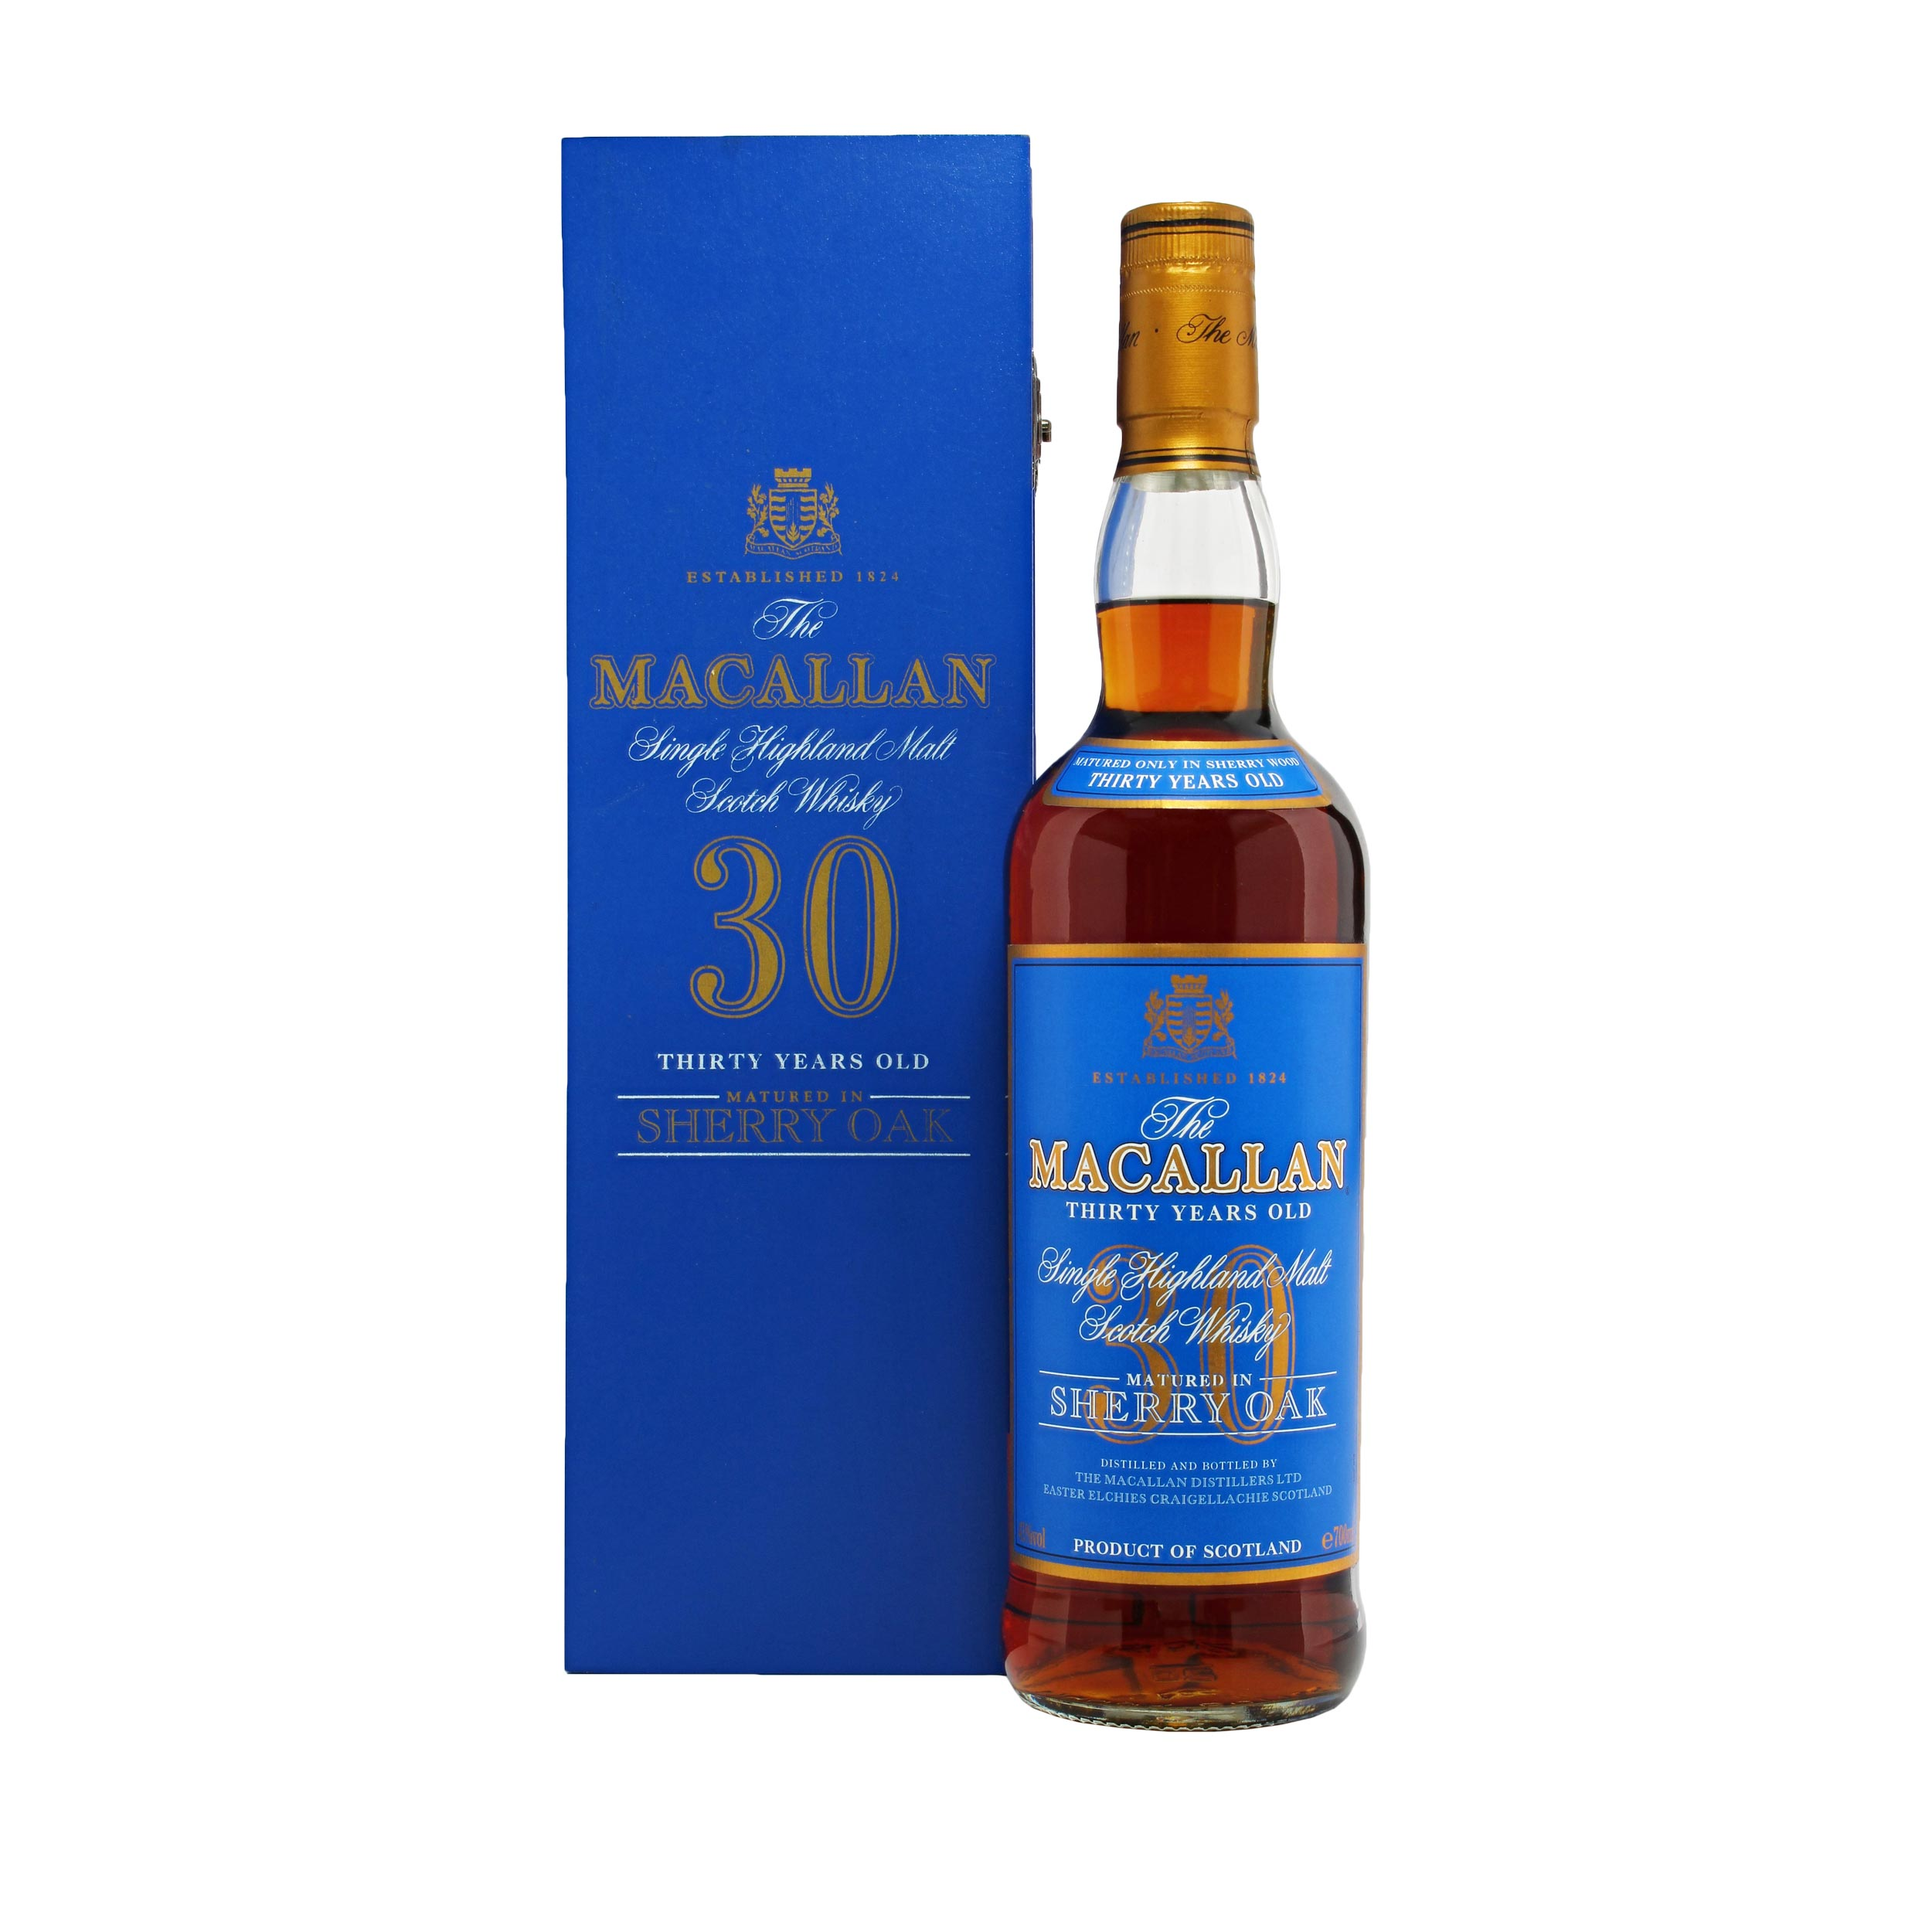 Macallan 30 Year Old Sherry Oak (Old style) Speyside Single Malt Scotch Whisky 70cl